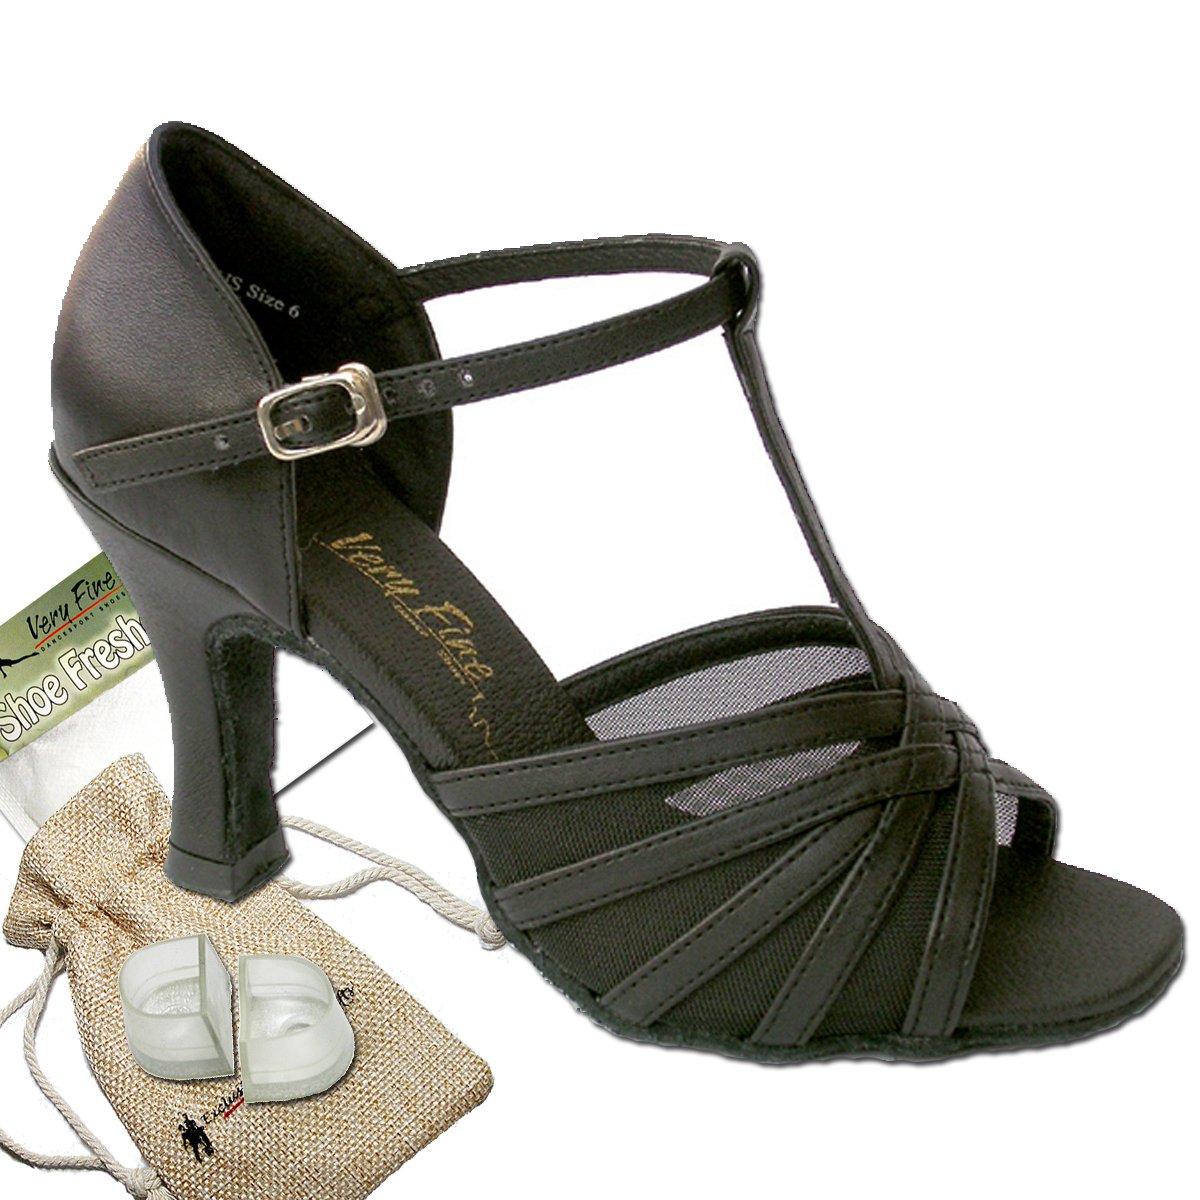 Women's Ballroom Dance Shoes Tango Wedding Salsa Dance Shoes Black Leather & Mesh 16612EB Comfortable - Very Fine 2.5'' Heel 8 M US [Bundle of 5]